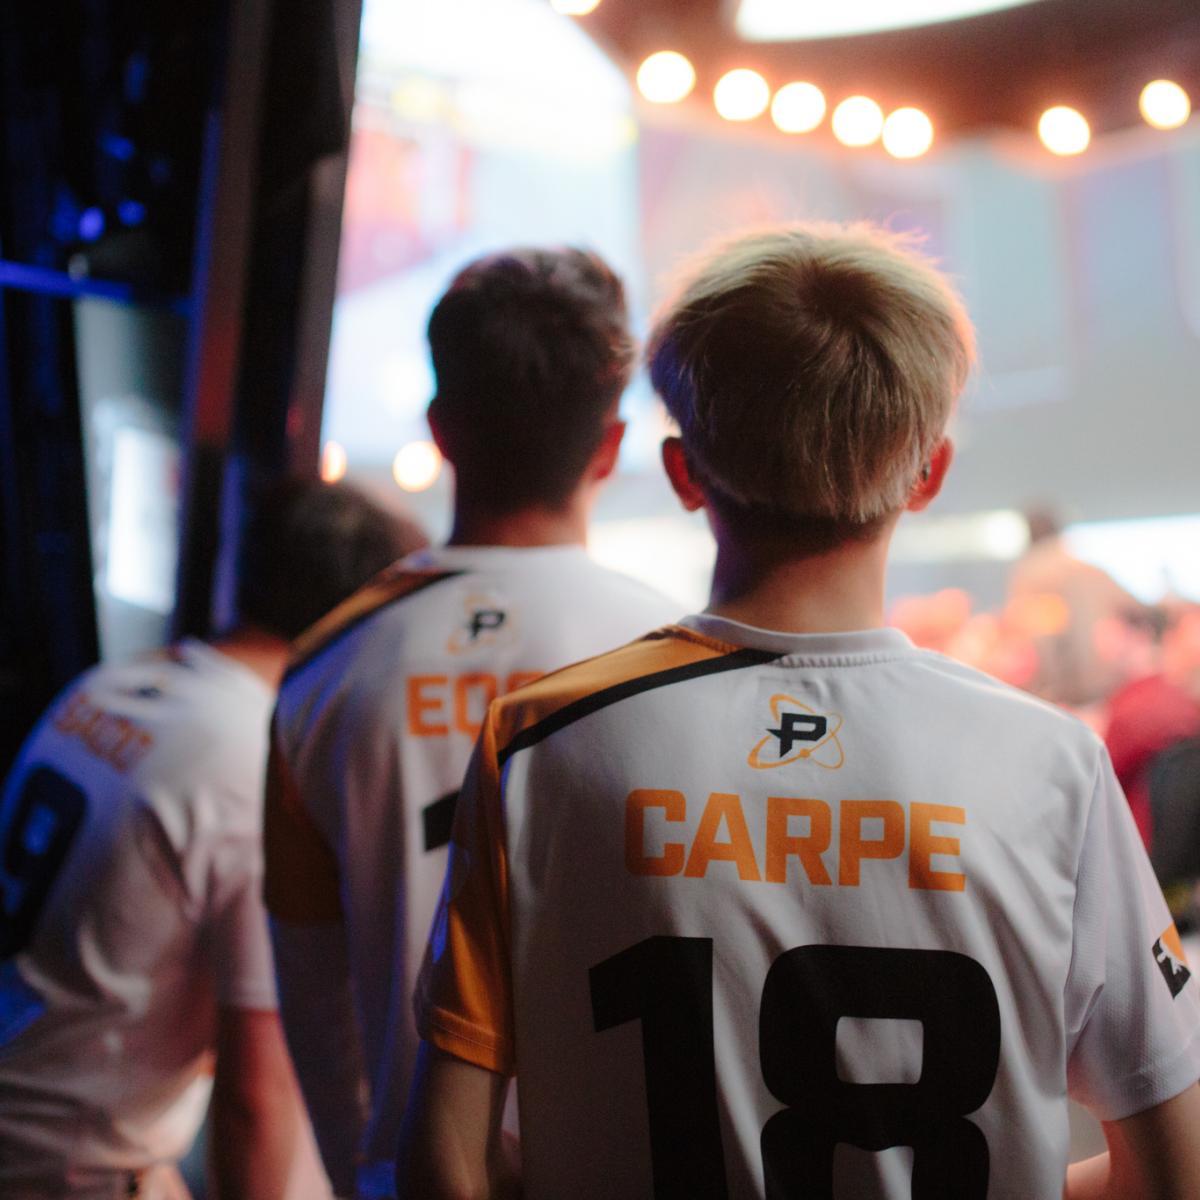 Overwatch League 2020 Week 2: Carpe's Top Plays, Prize Money